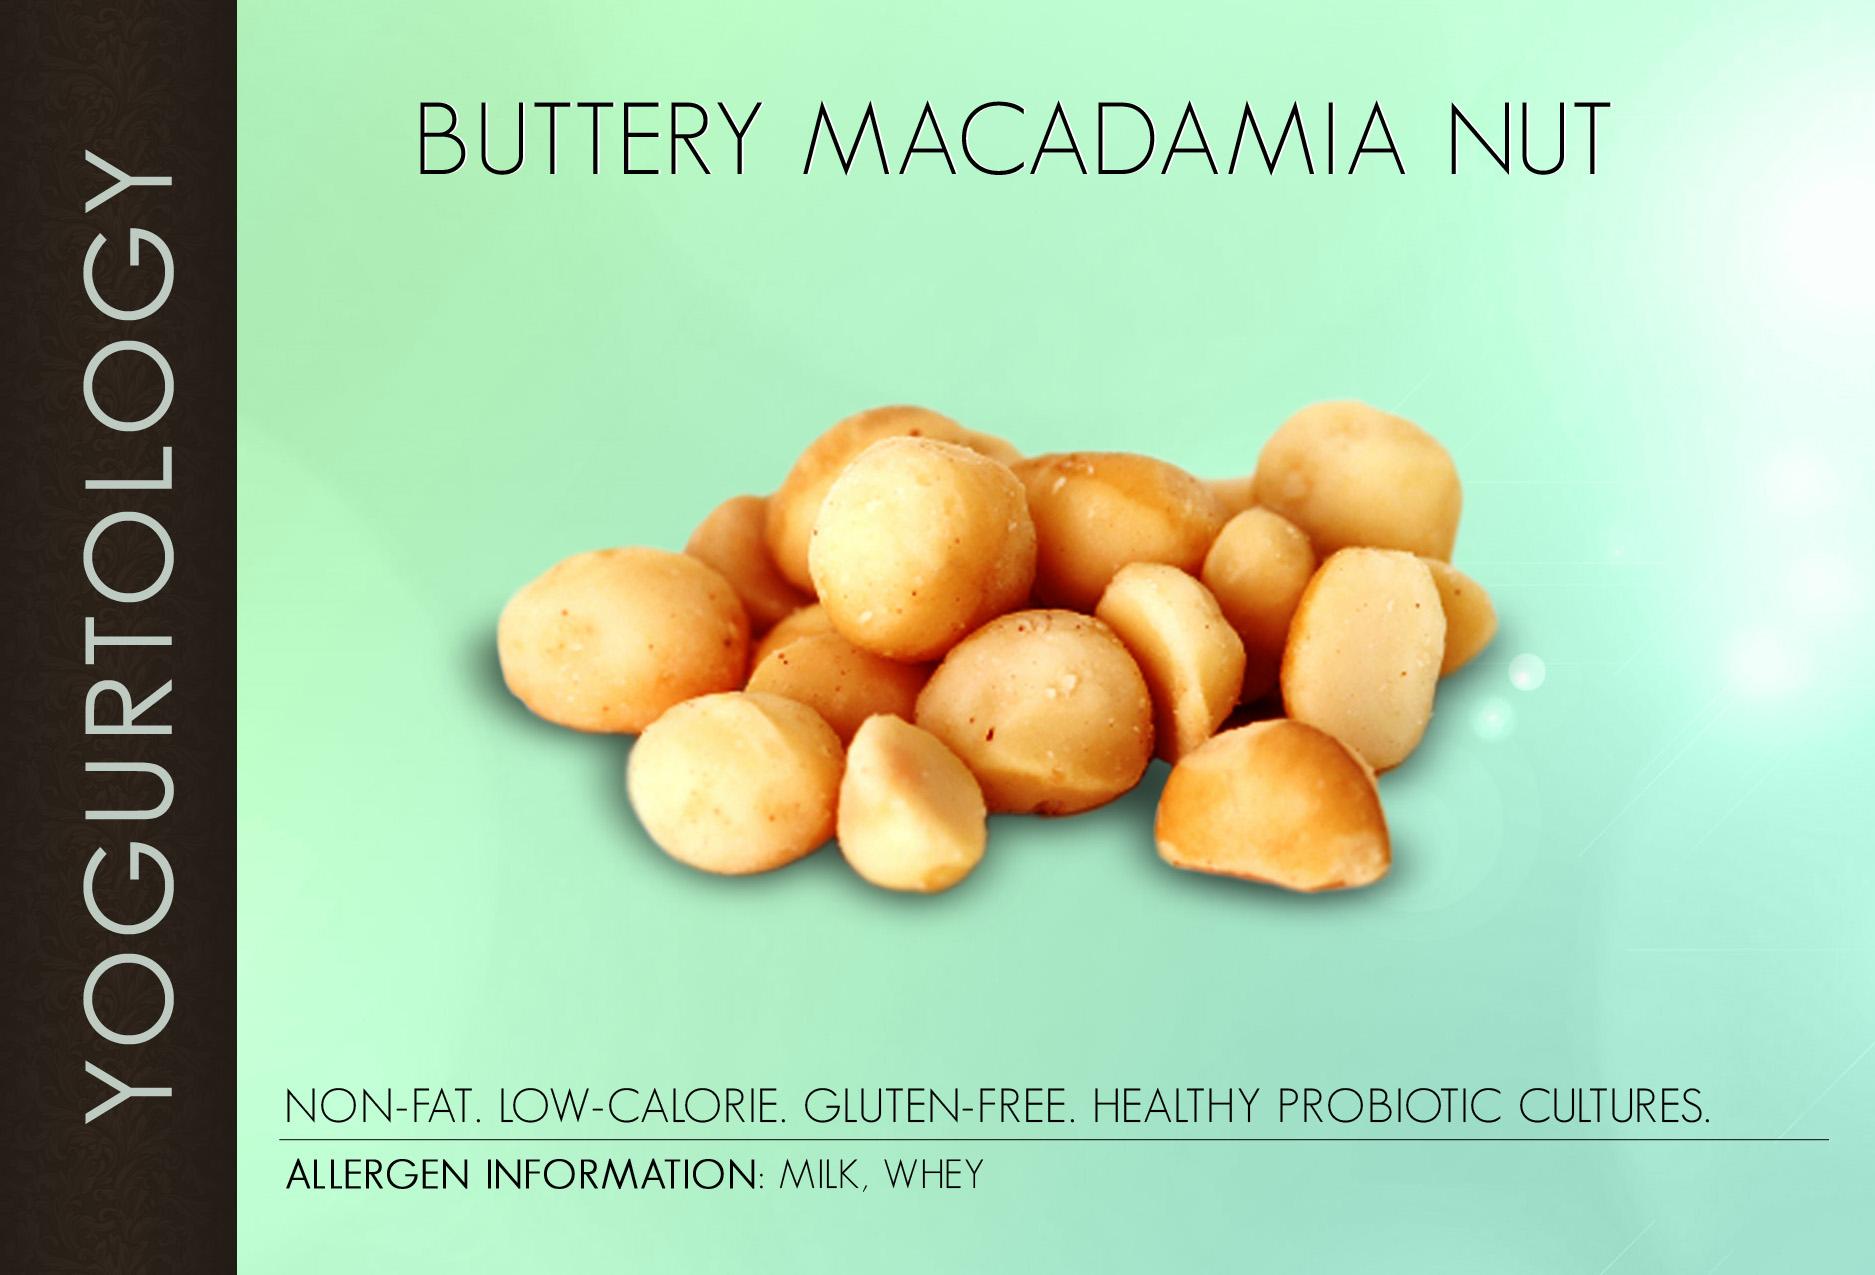 Buttery Macadamia Nut